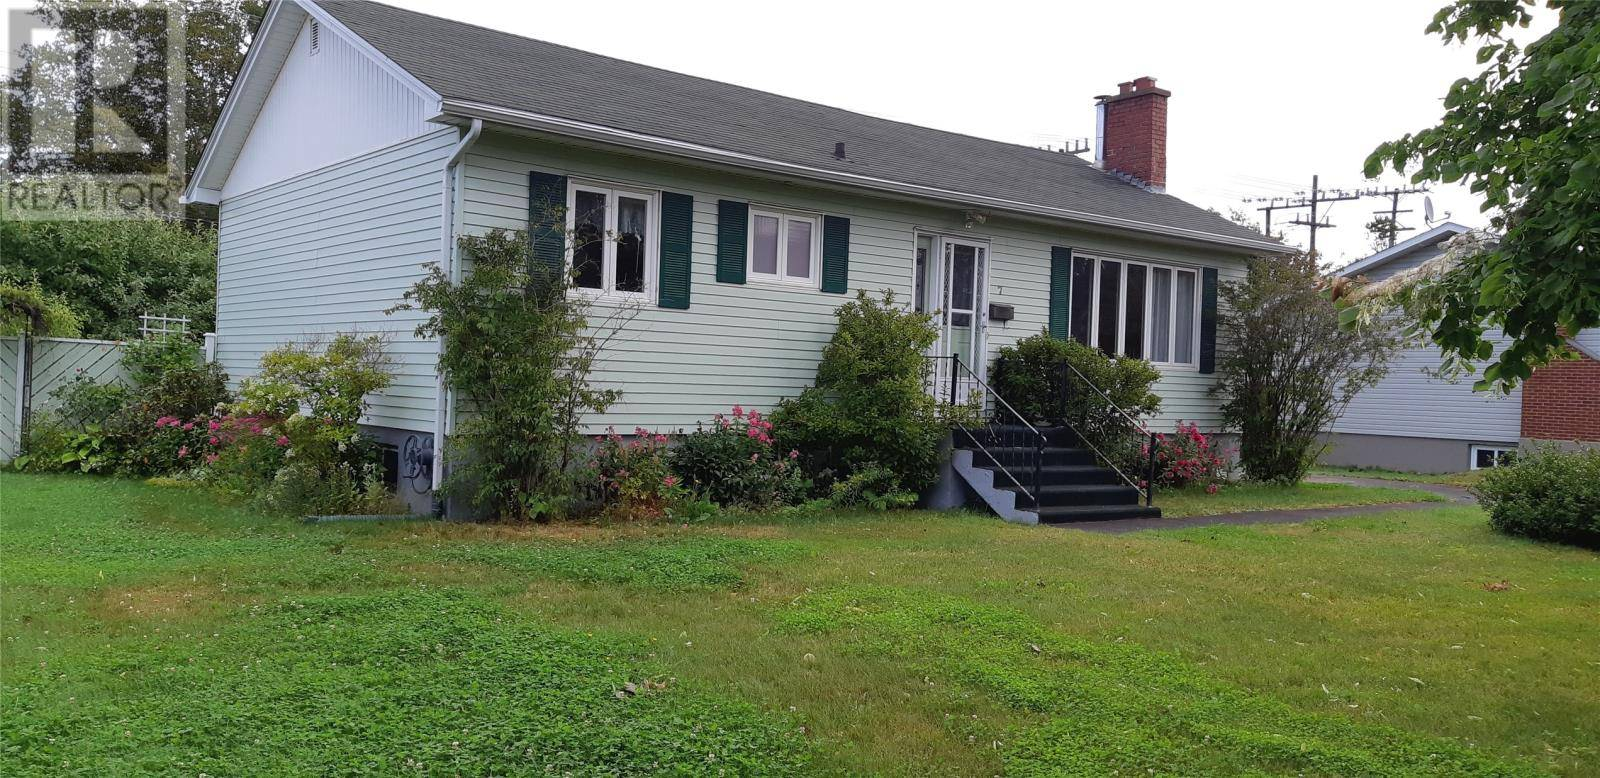 House for sale at 7 Lind Ave Grand Falls Windsor Newfoundland - MLS: 1196671